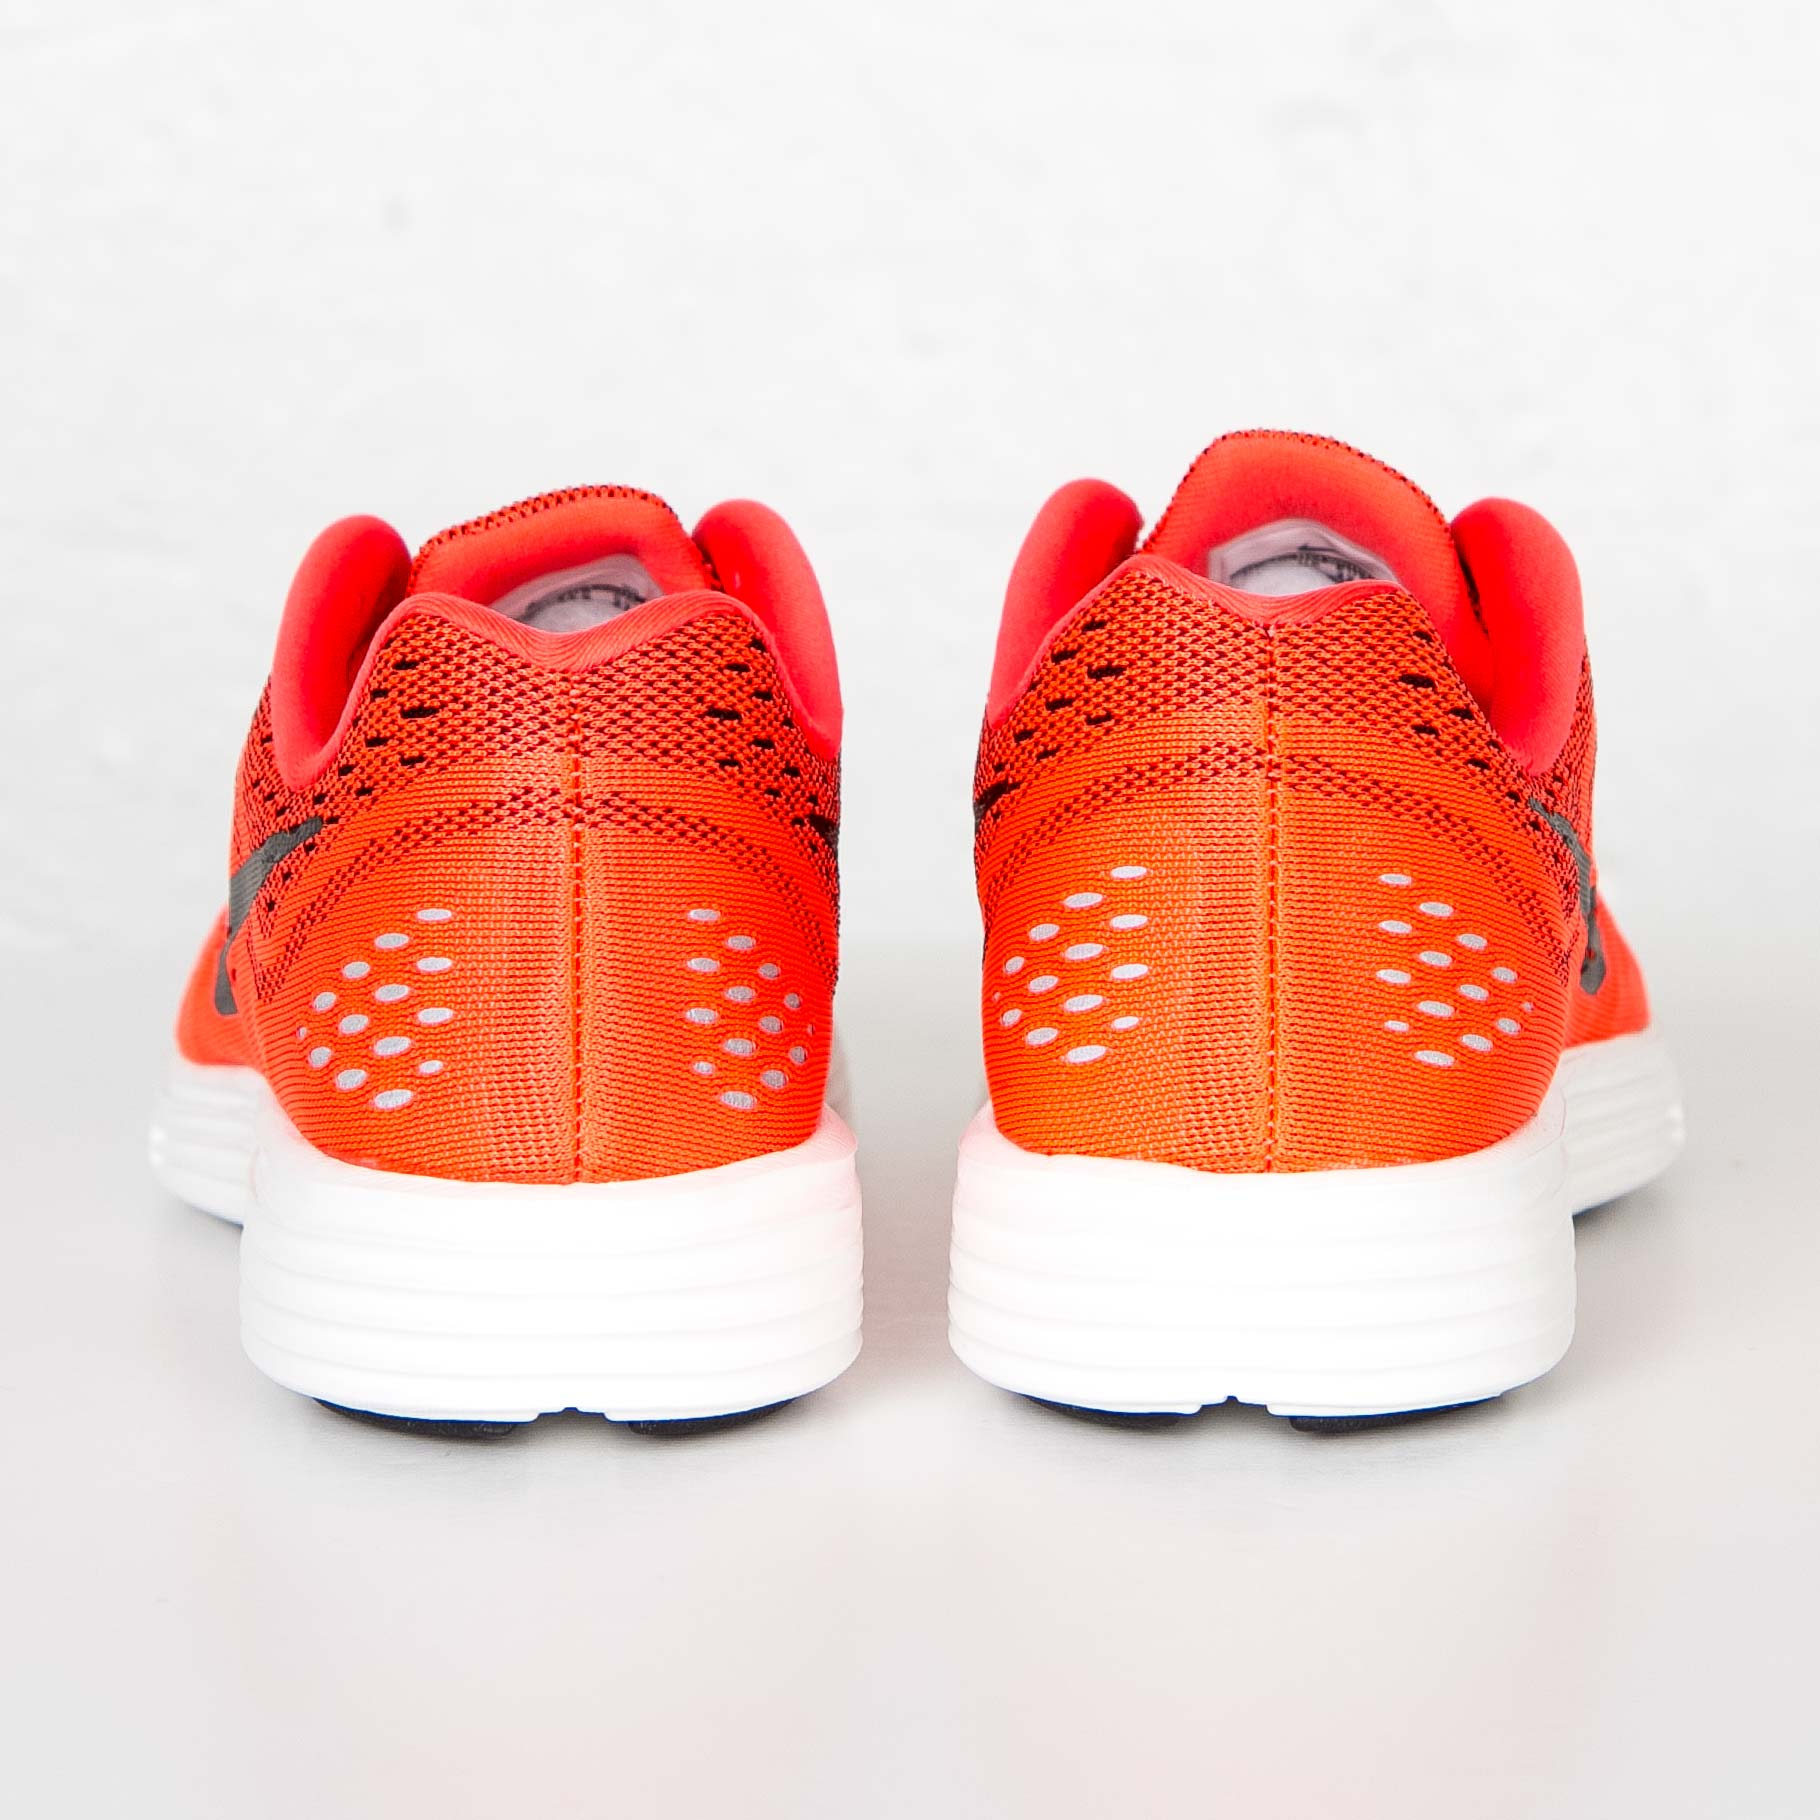 Nike Lunartempo Nike Lunartempo Nike Lunartempo ... 7b8225deee